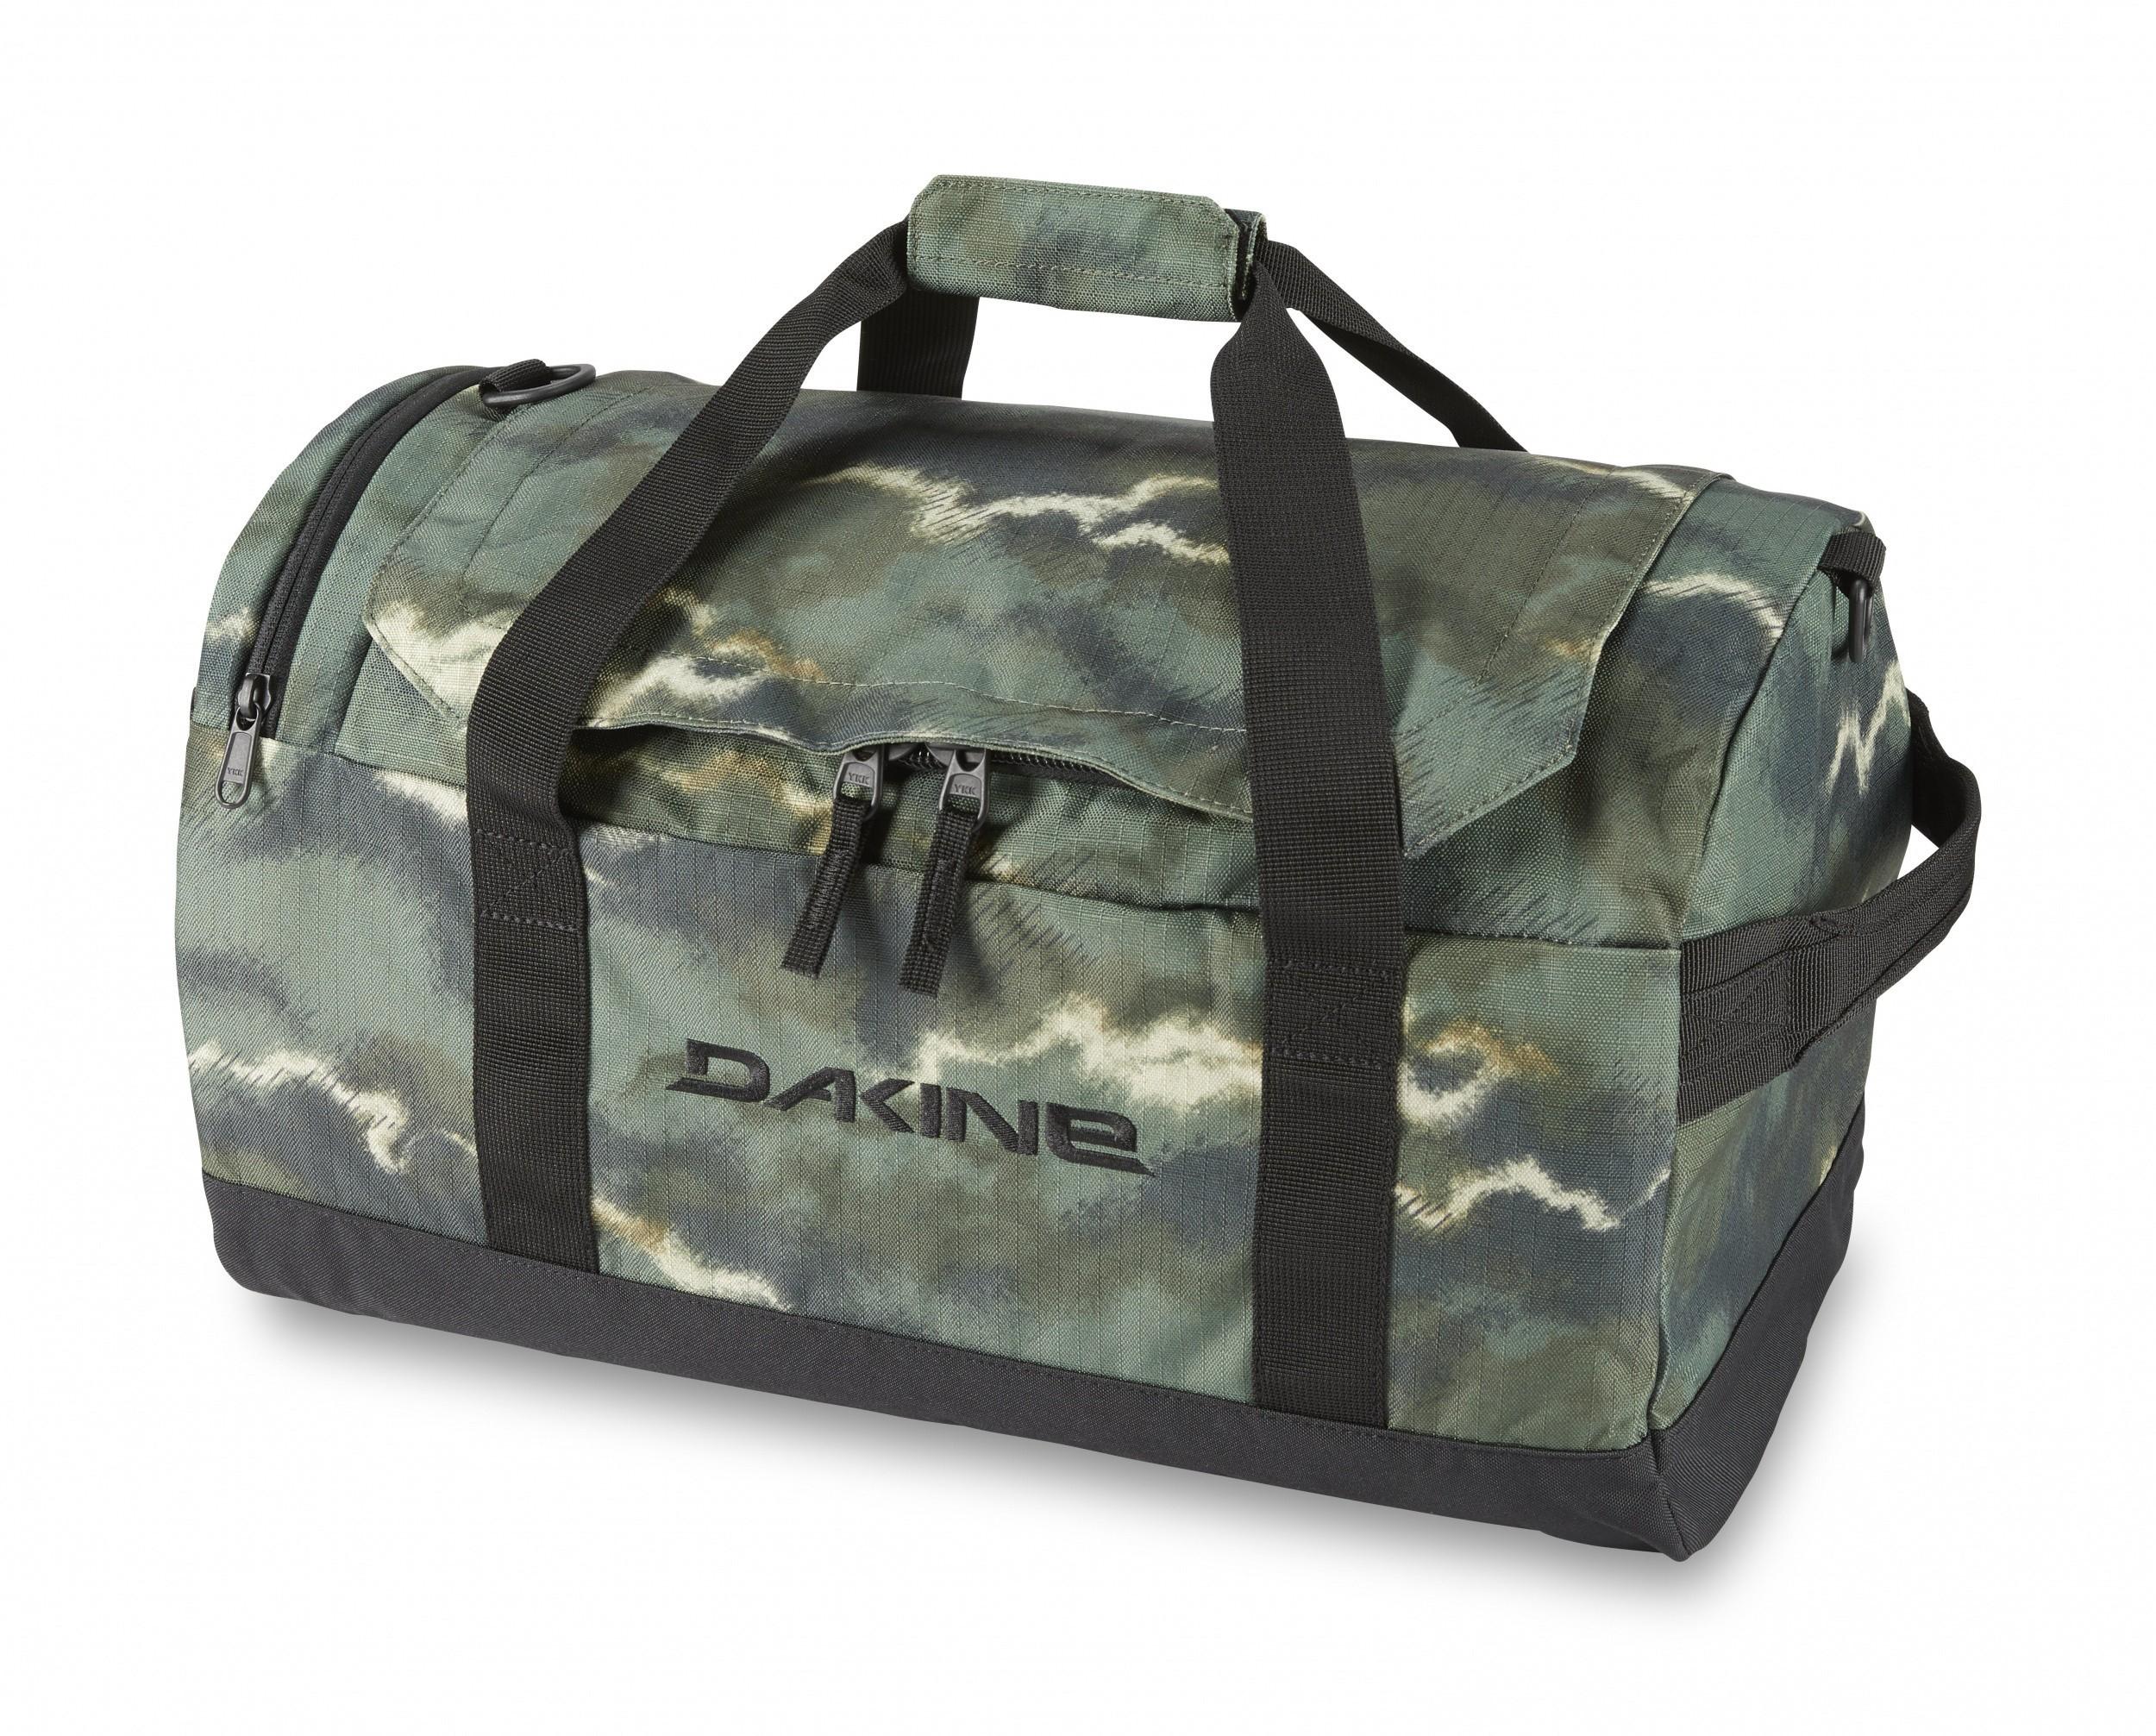 Cestovní taška Dakine EQ Duffle 70L - FW20 Olive Ashcroft